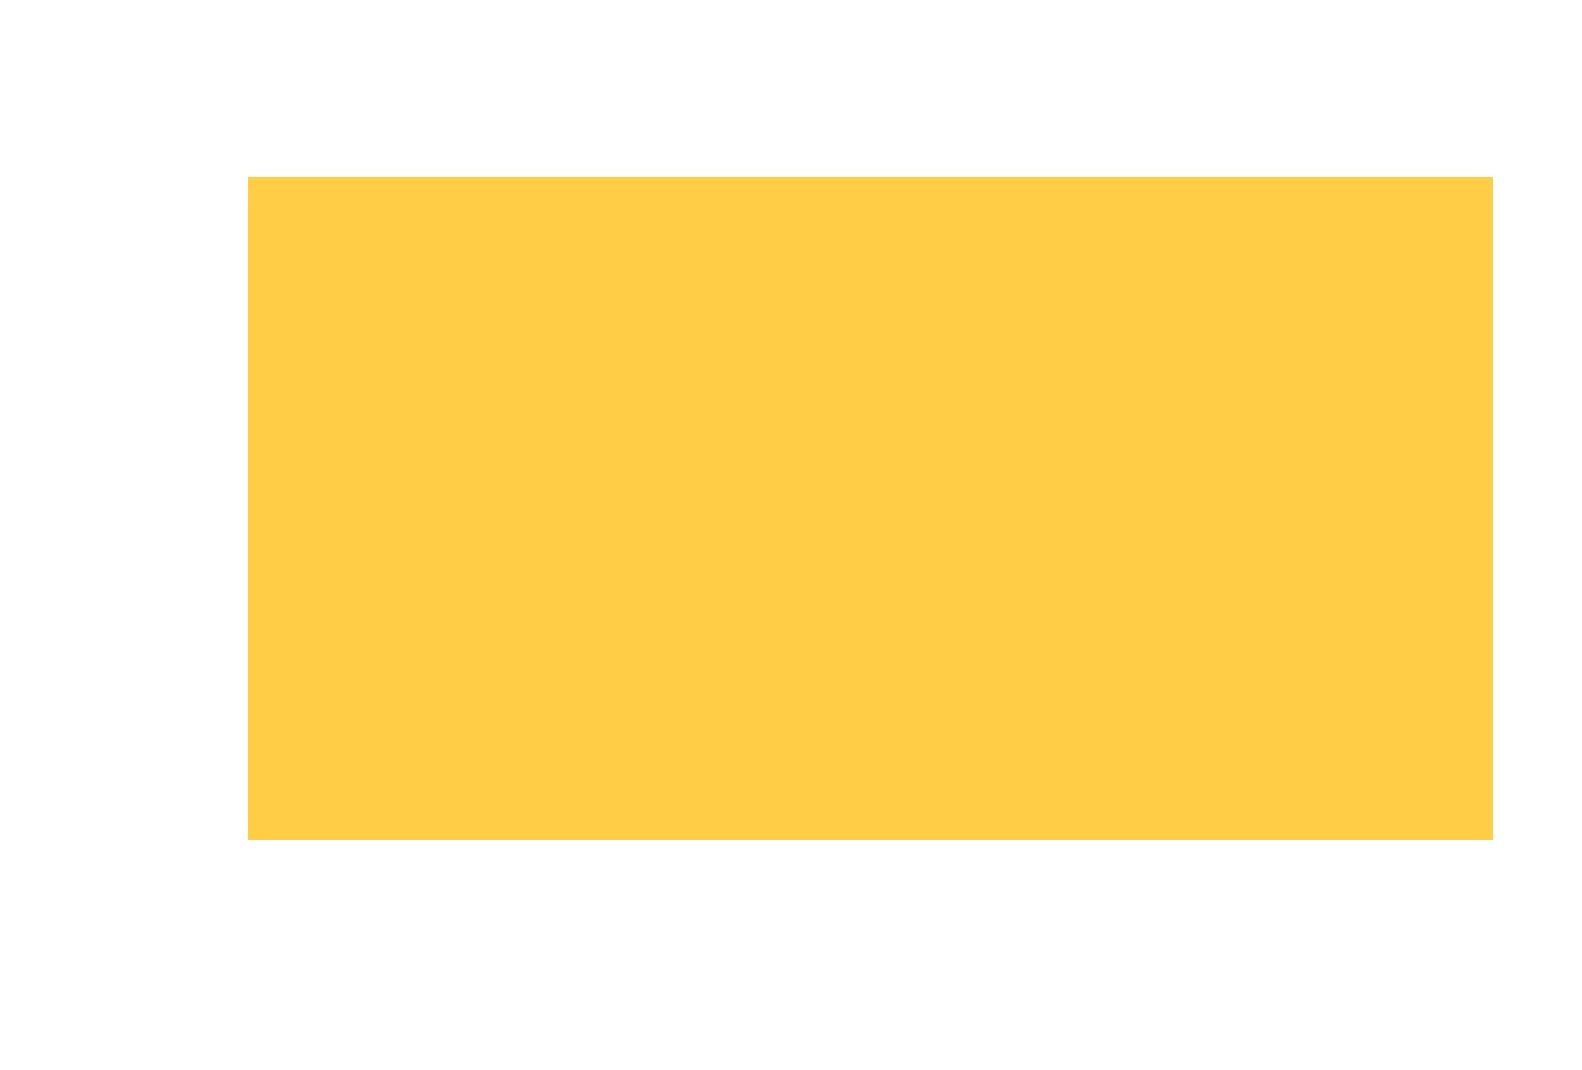 IHZ_openhouse_logo_date_yellow_r.png